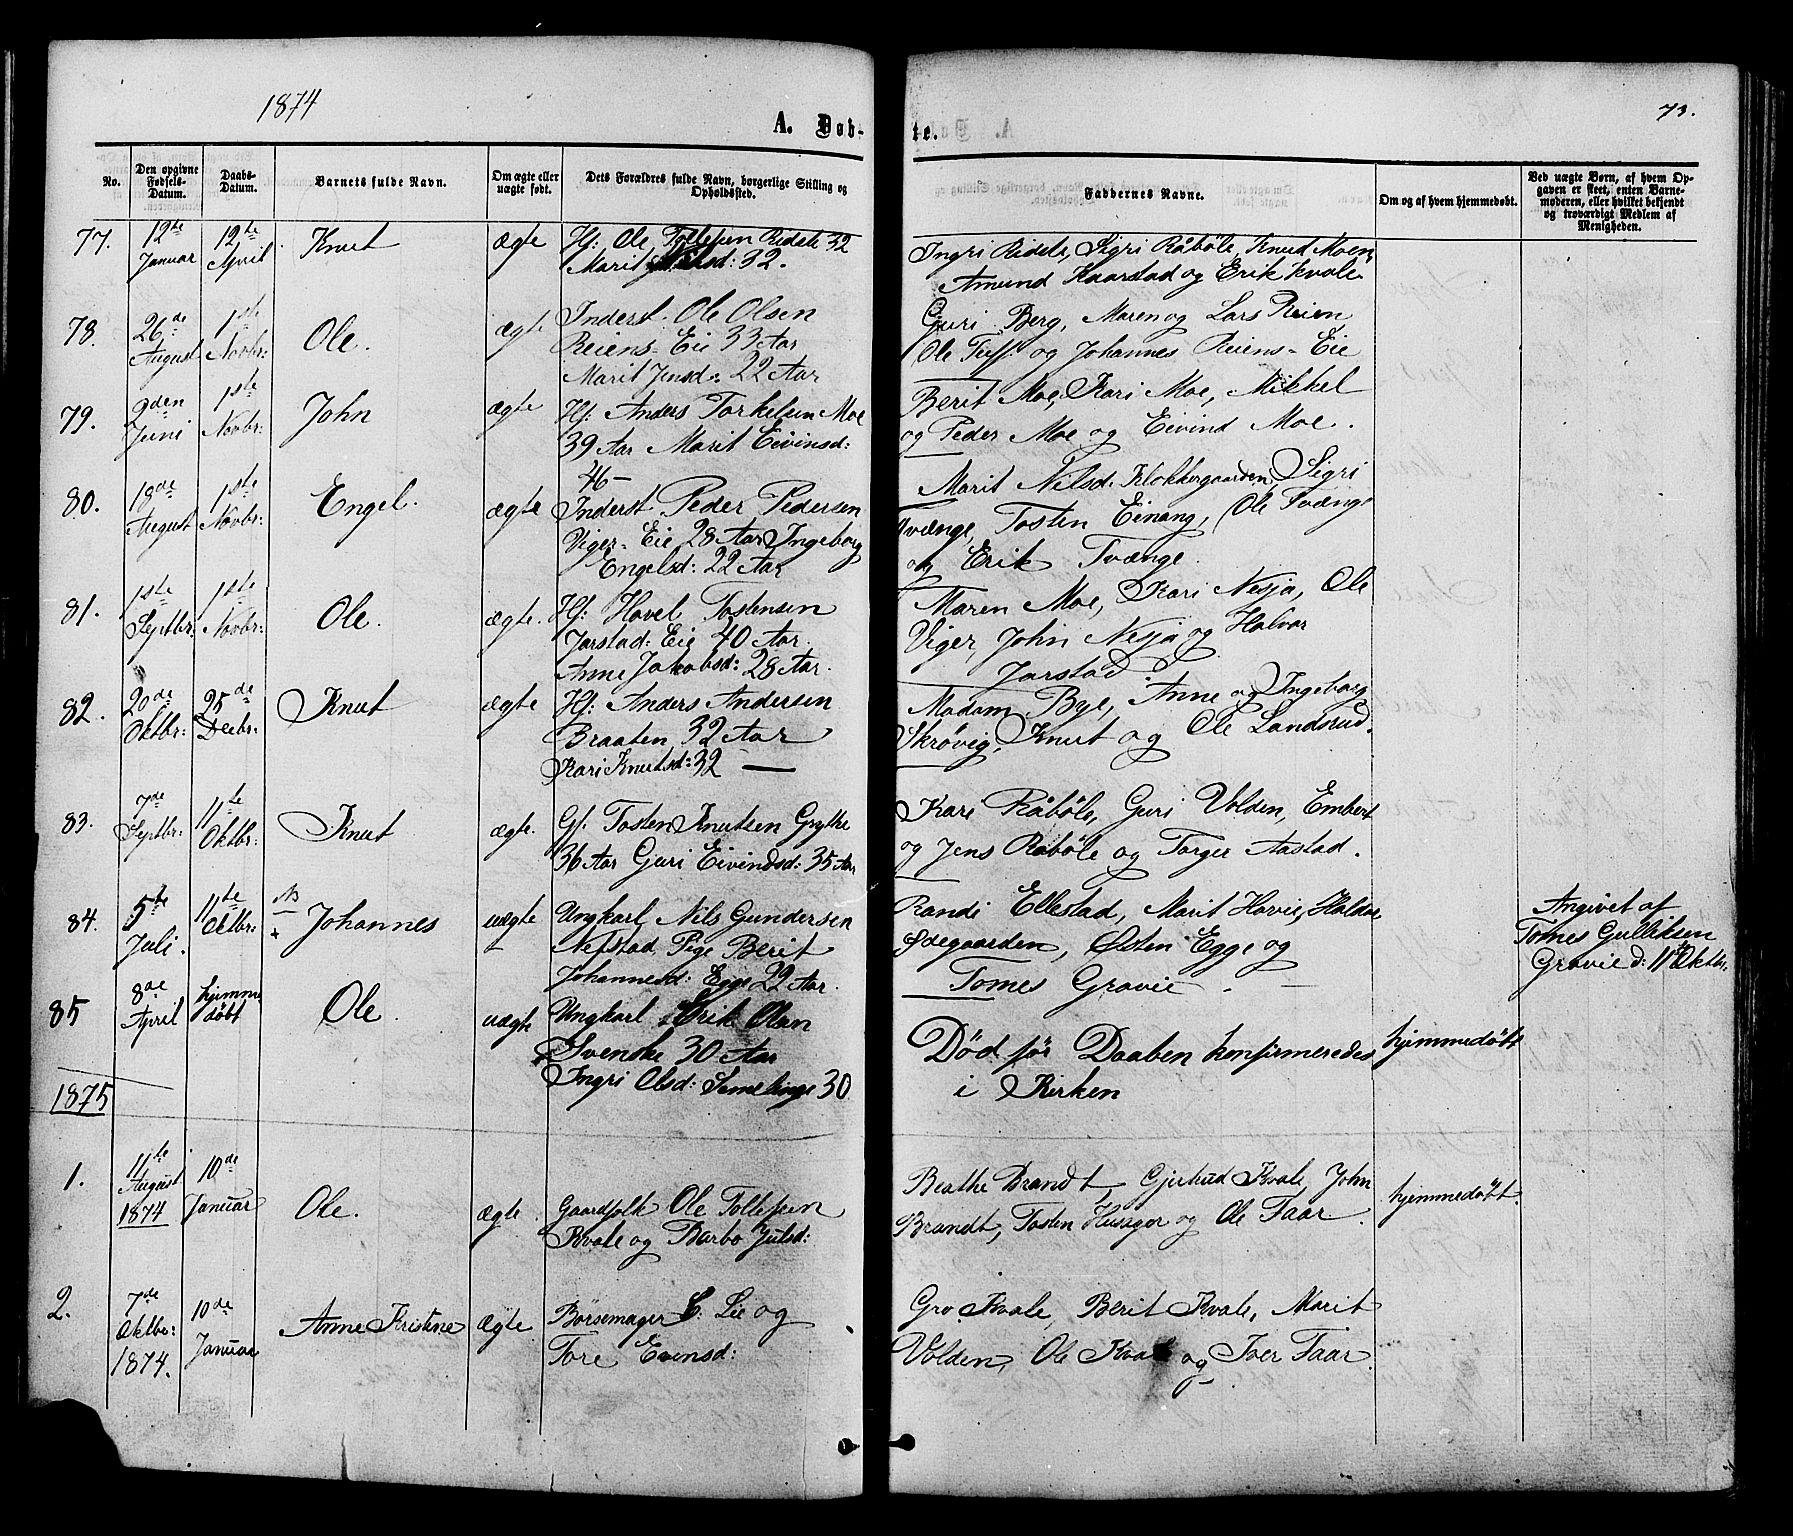 SAH, Vestre Slidre prestekontor, Ministerialbok nr. 3, 1865-1880, s. 73